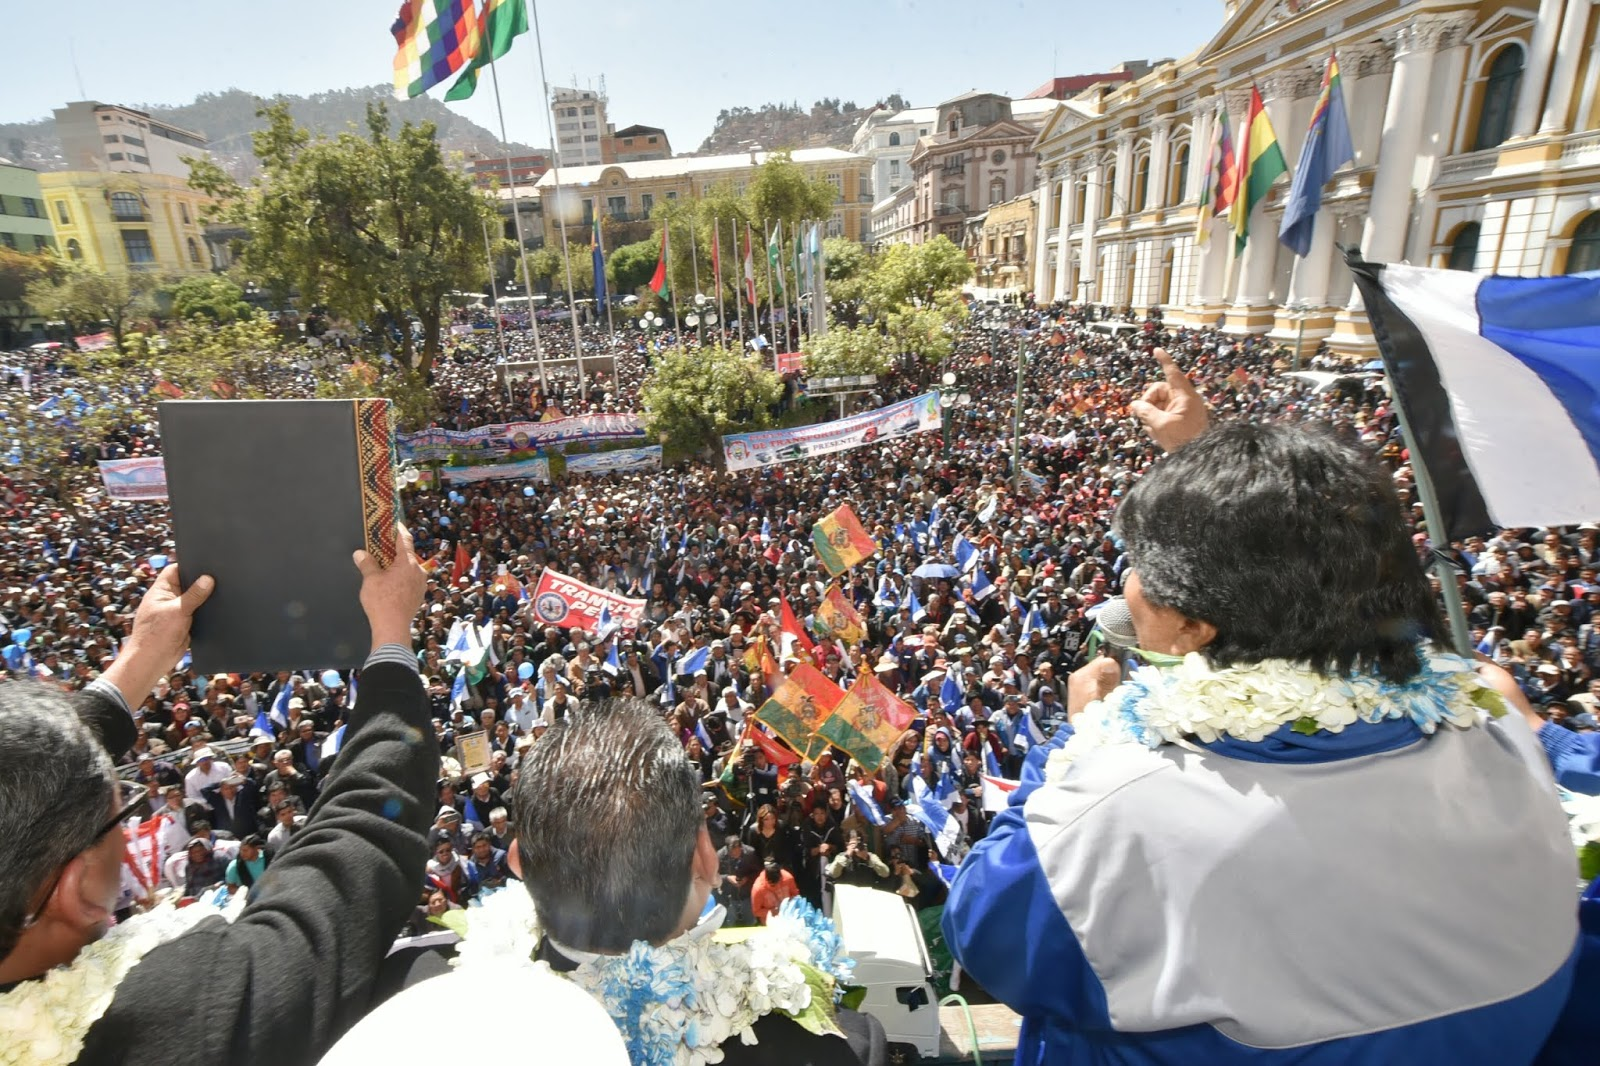 Miles de transportistas entraron a Plaza Murillo para escuchar el discurso político de Morales / ABI